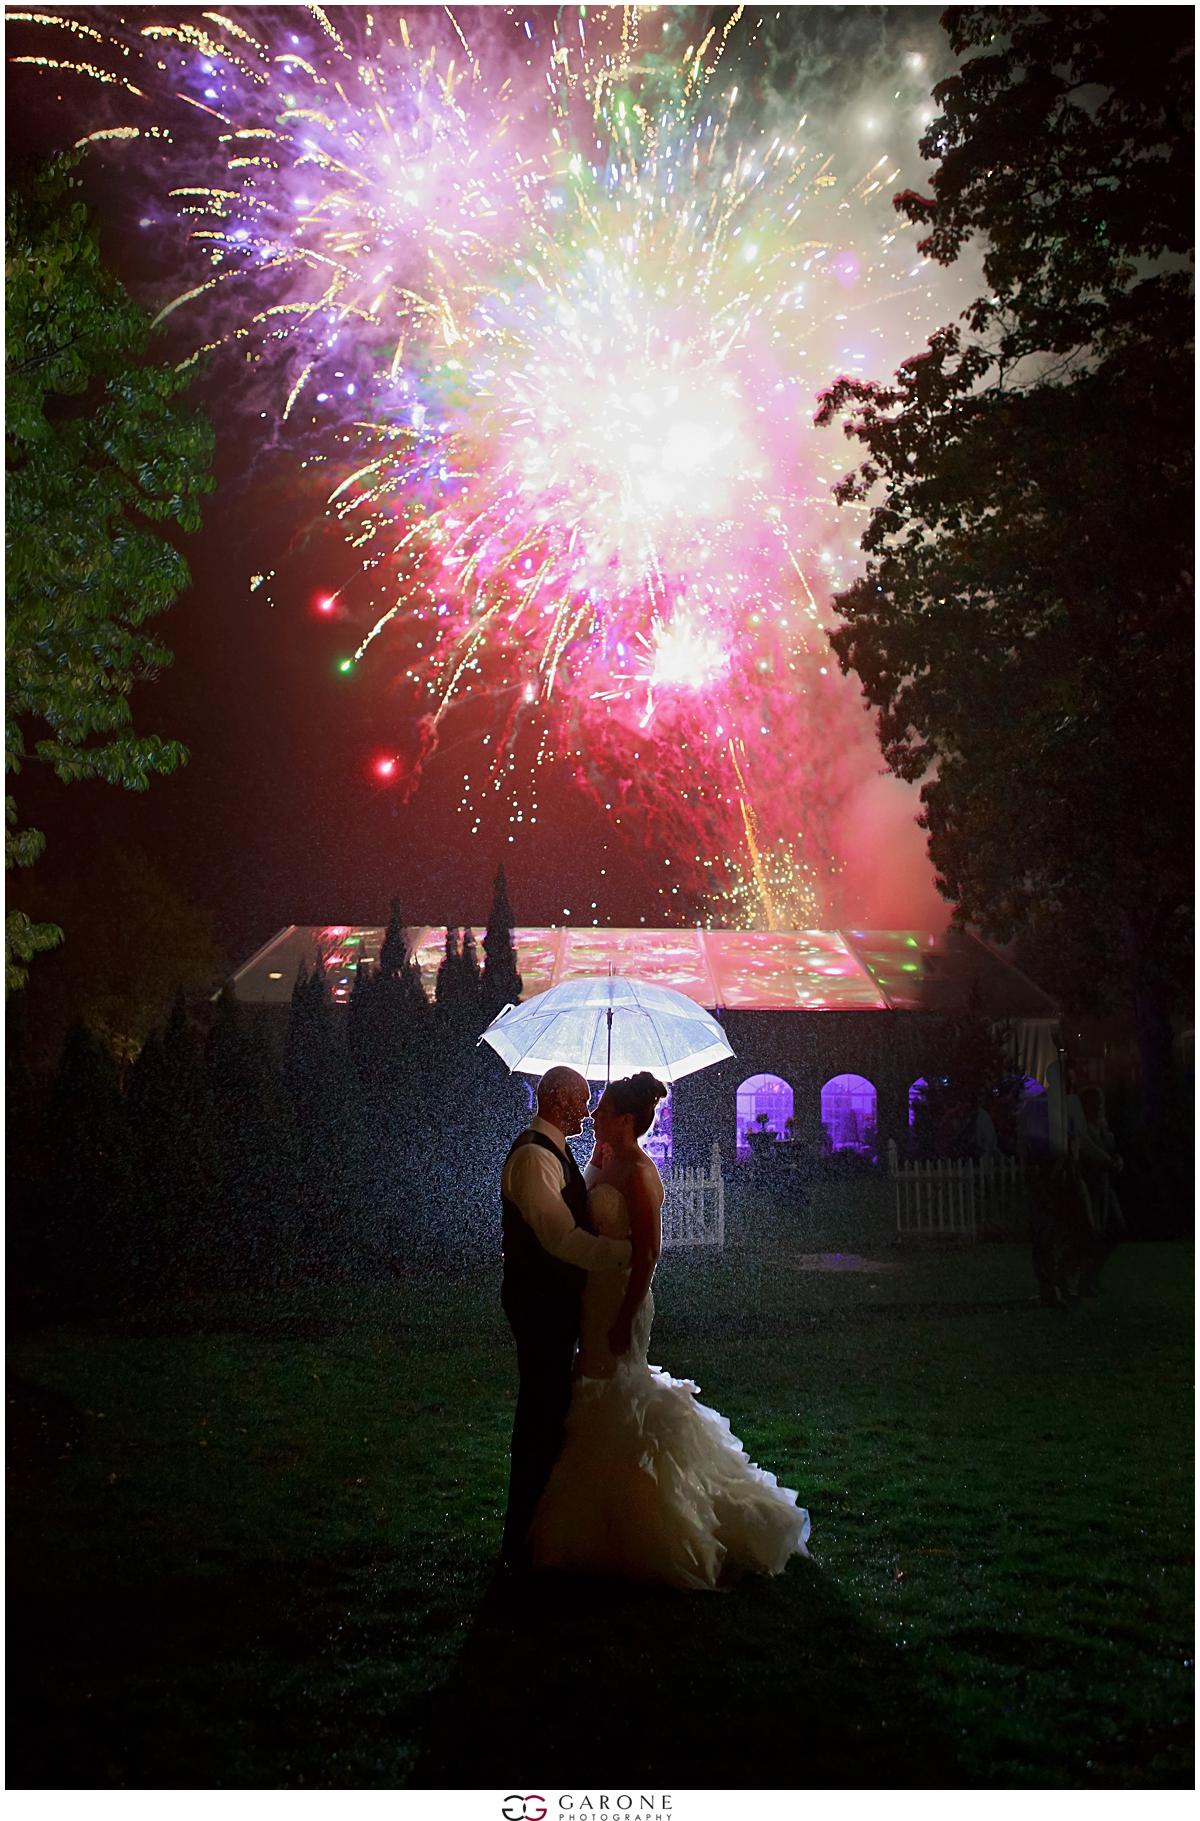 Garone_Photography_The Margate_Wedding_Lake Winnipasaukee_Wedding_0027.jpg